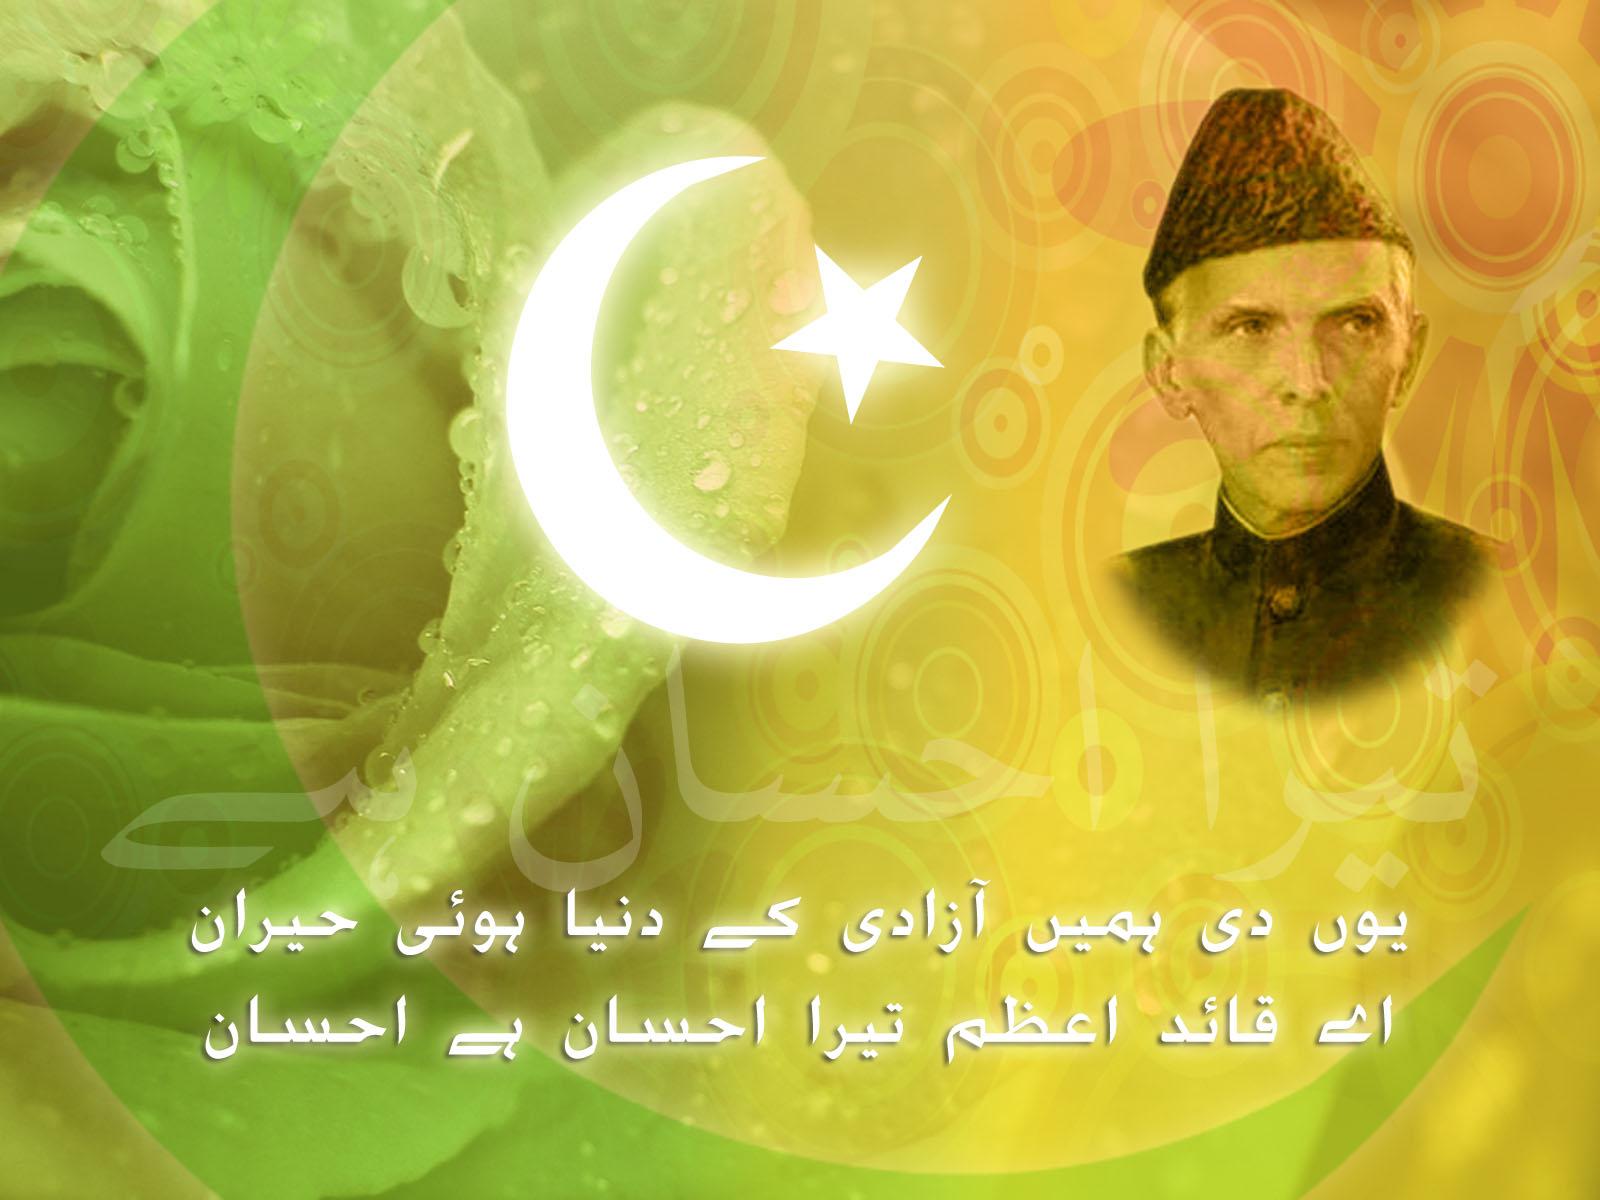 14 august pakistan wallpaper full - photo #5